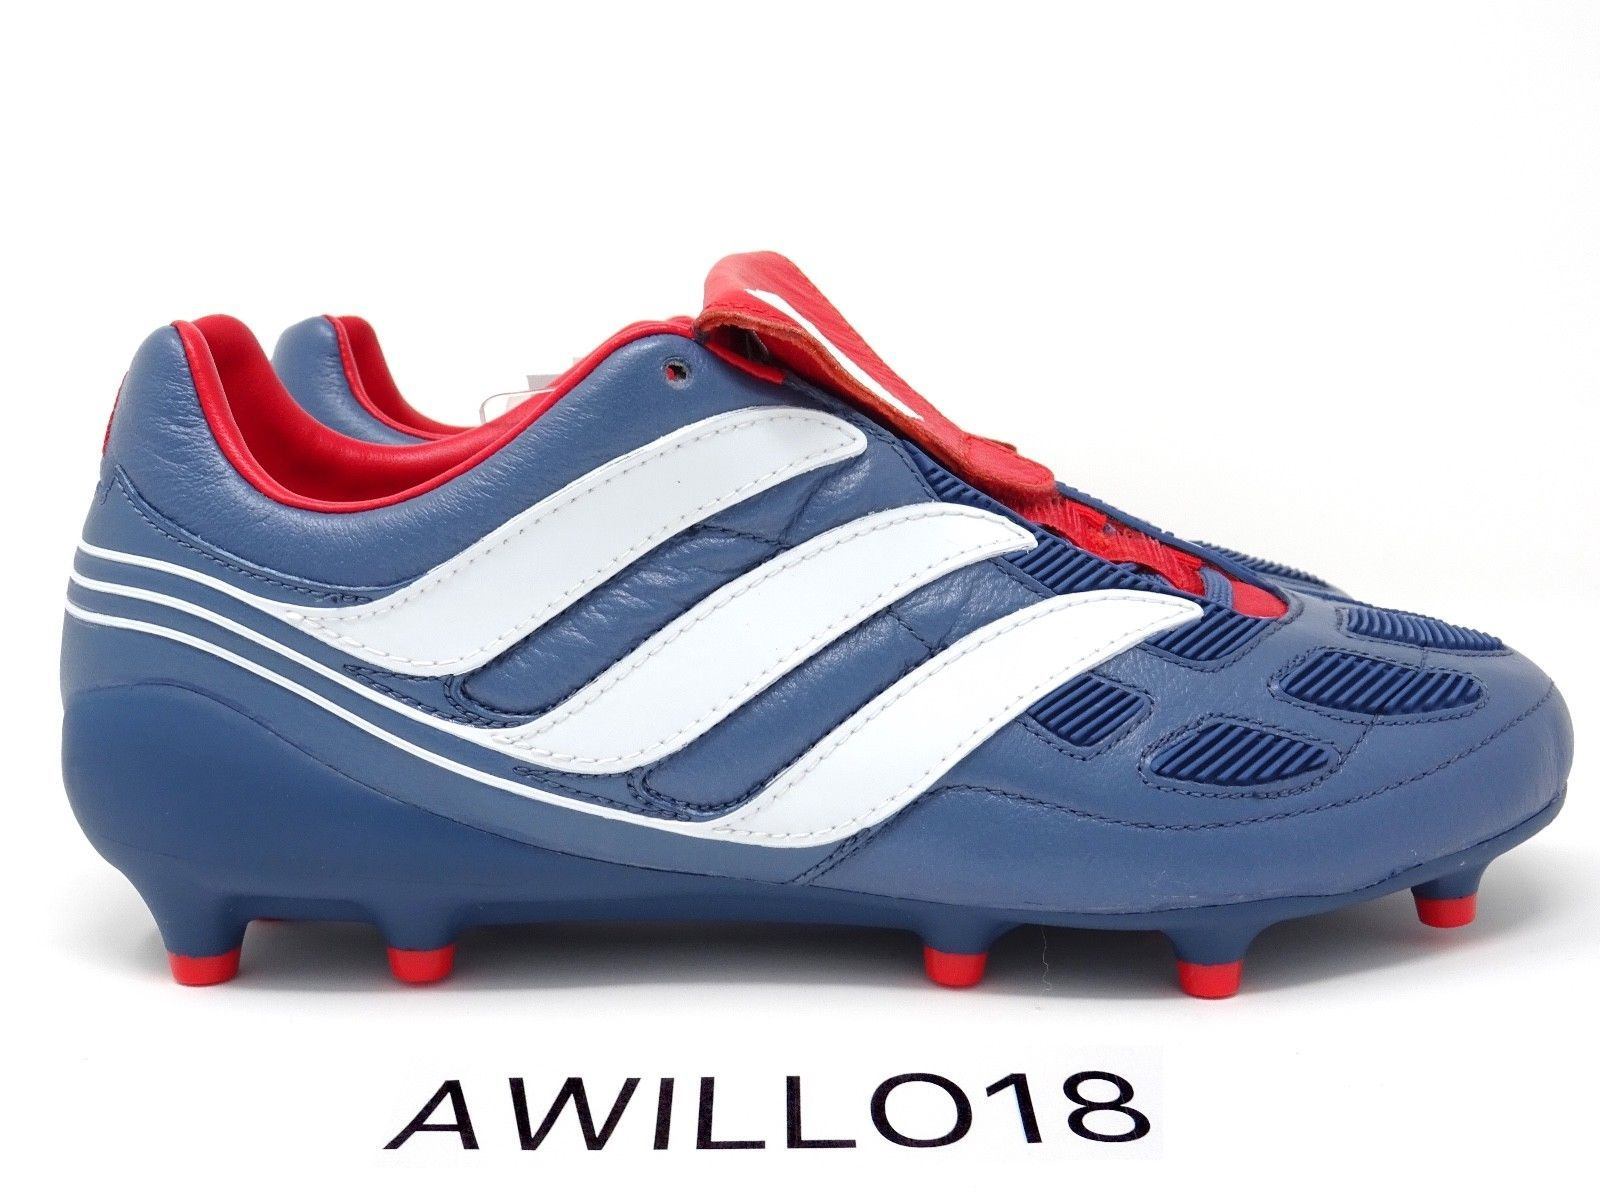 taille 40 e0148 fd65f Adidas Predator Precision Remake FG Football Boots Blue UK 7 ...